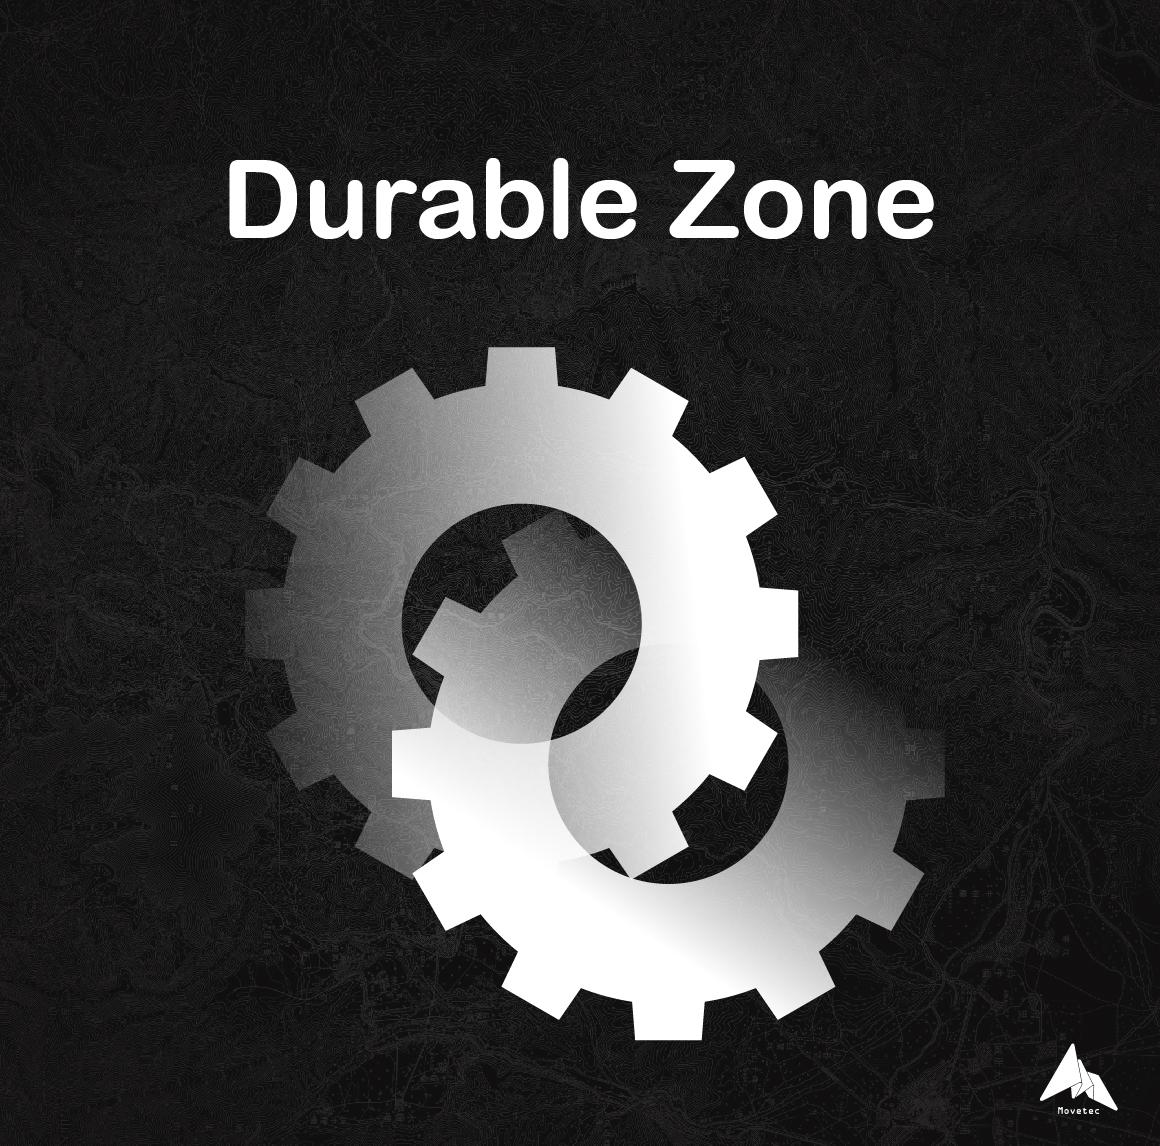 Durable Zone